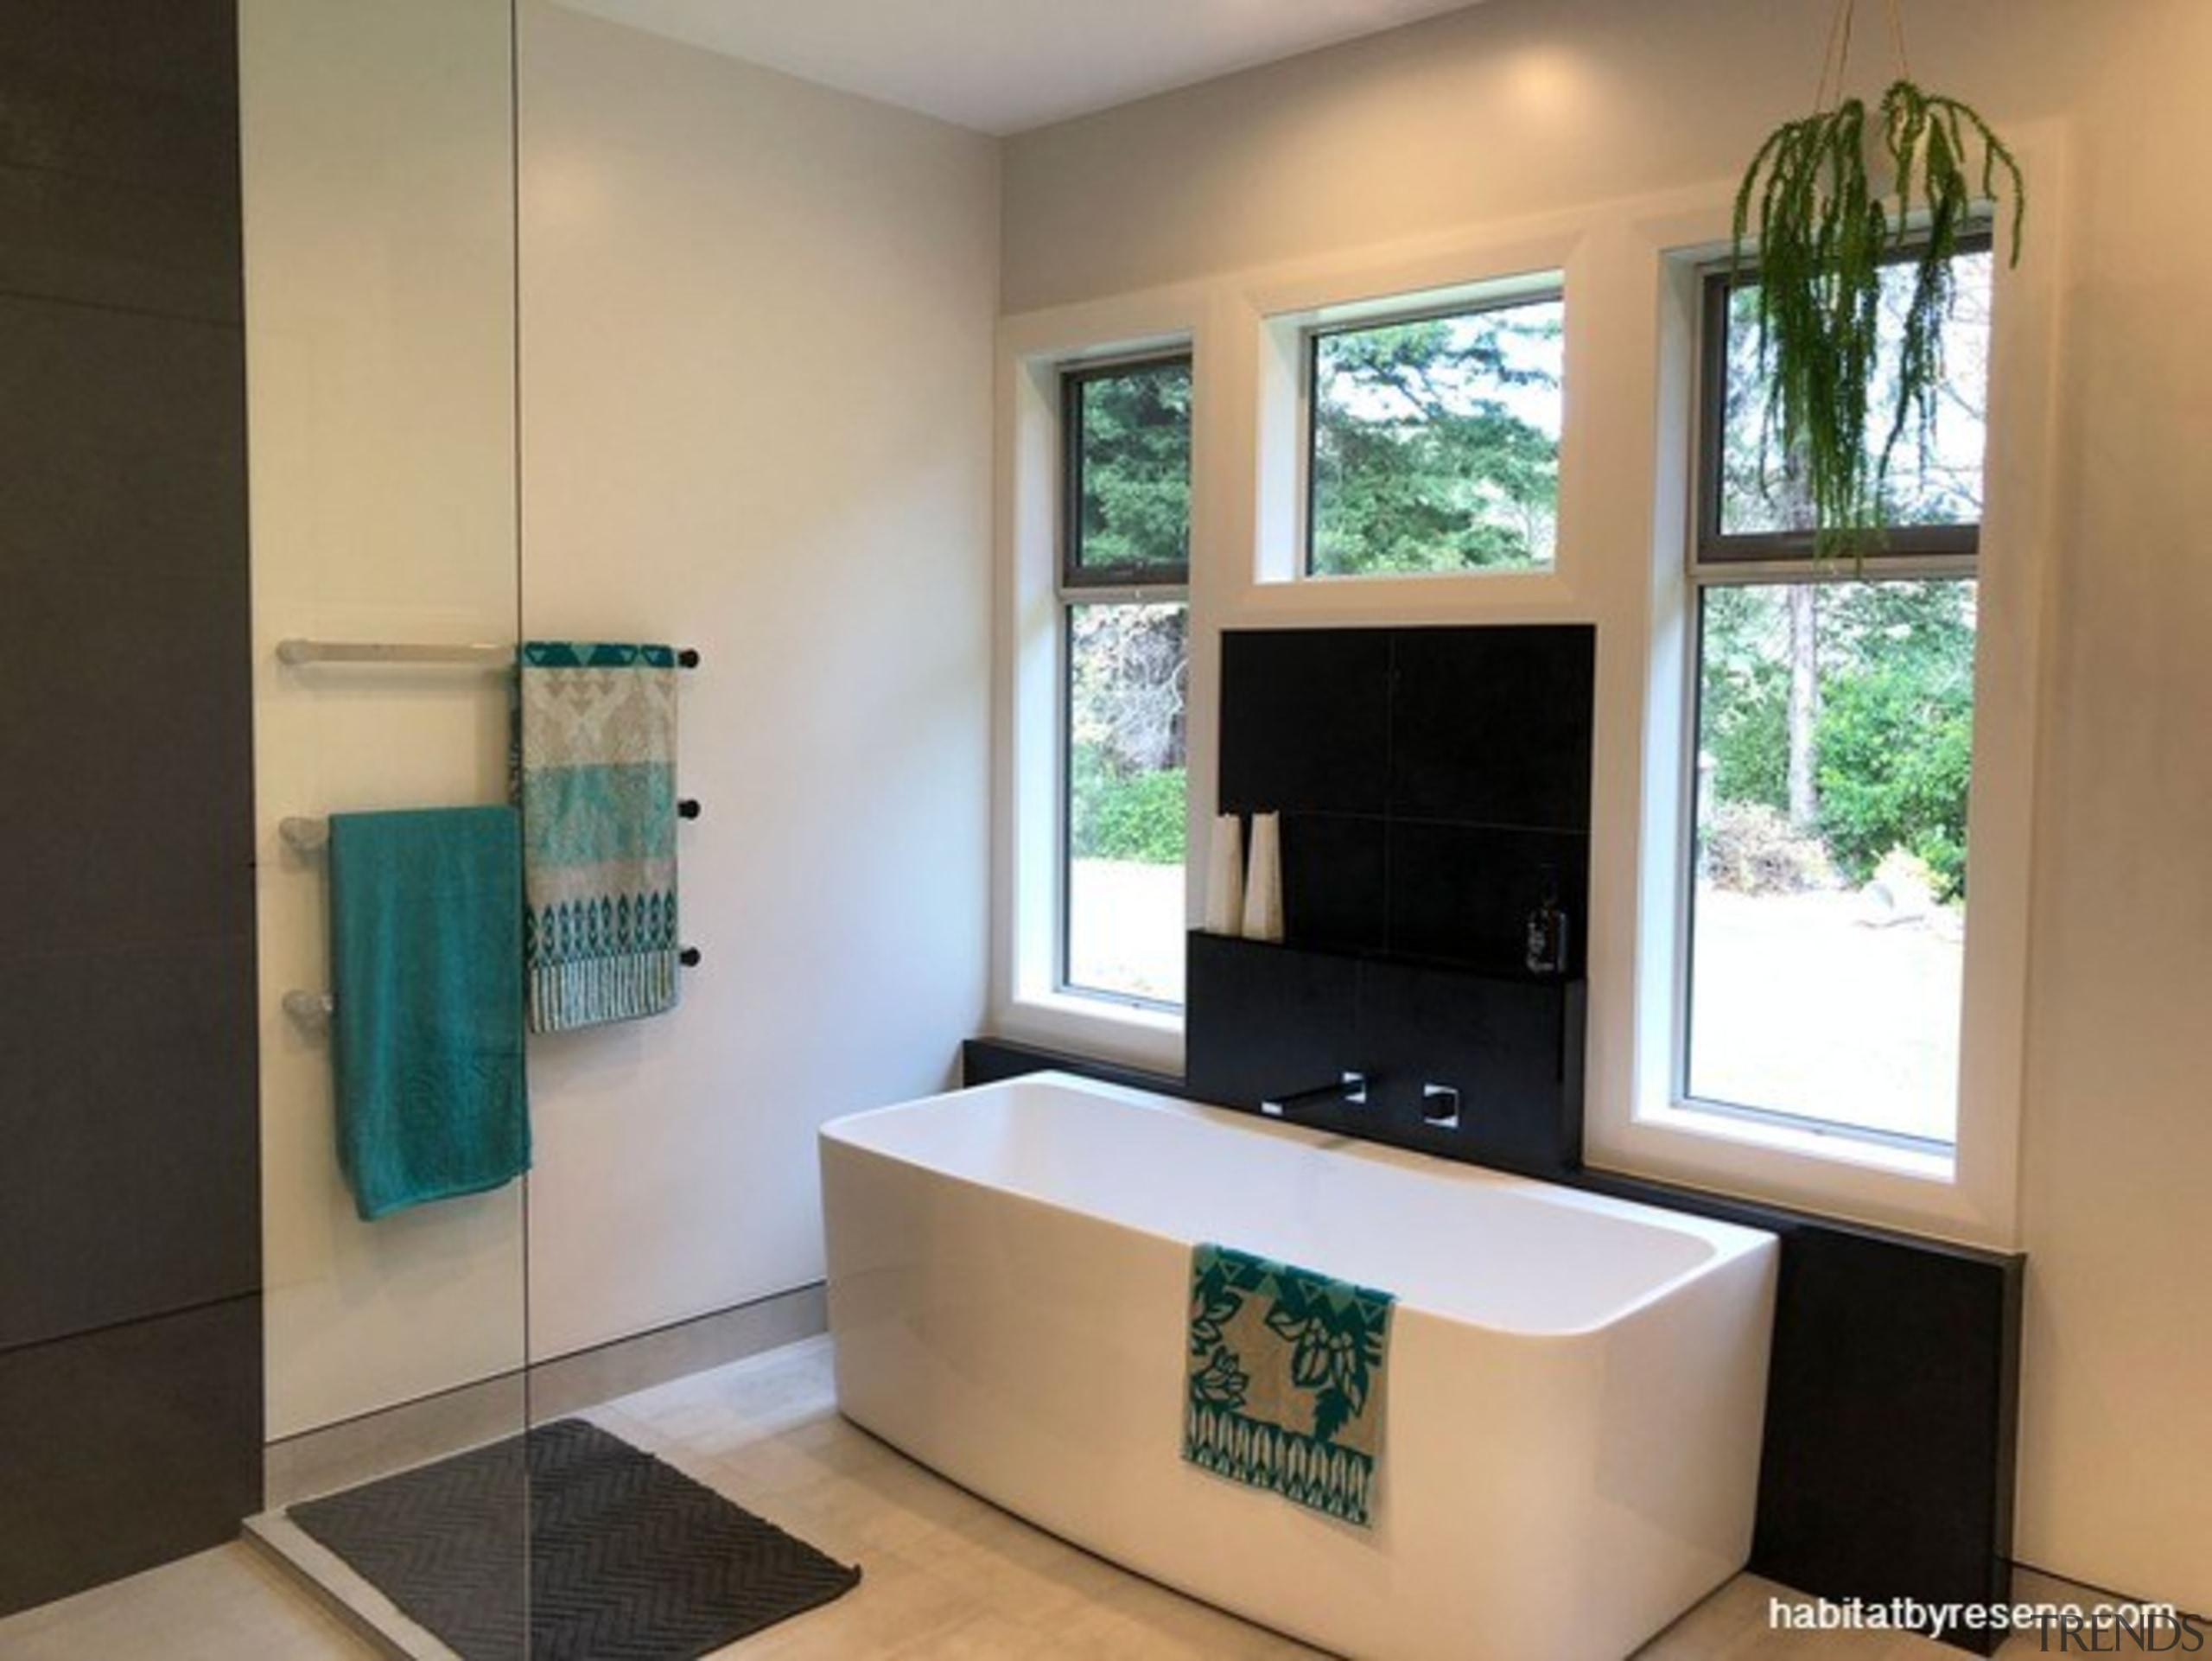 Bathroom - architecture | bathroom | bathroom cabinet architecture, bathroom, bathroom cabinet, building, ceiling, floor, furniture, home, house, interior design, property, real estate, room, sink, tile, window, gray